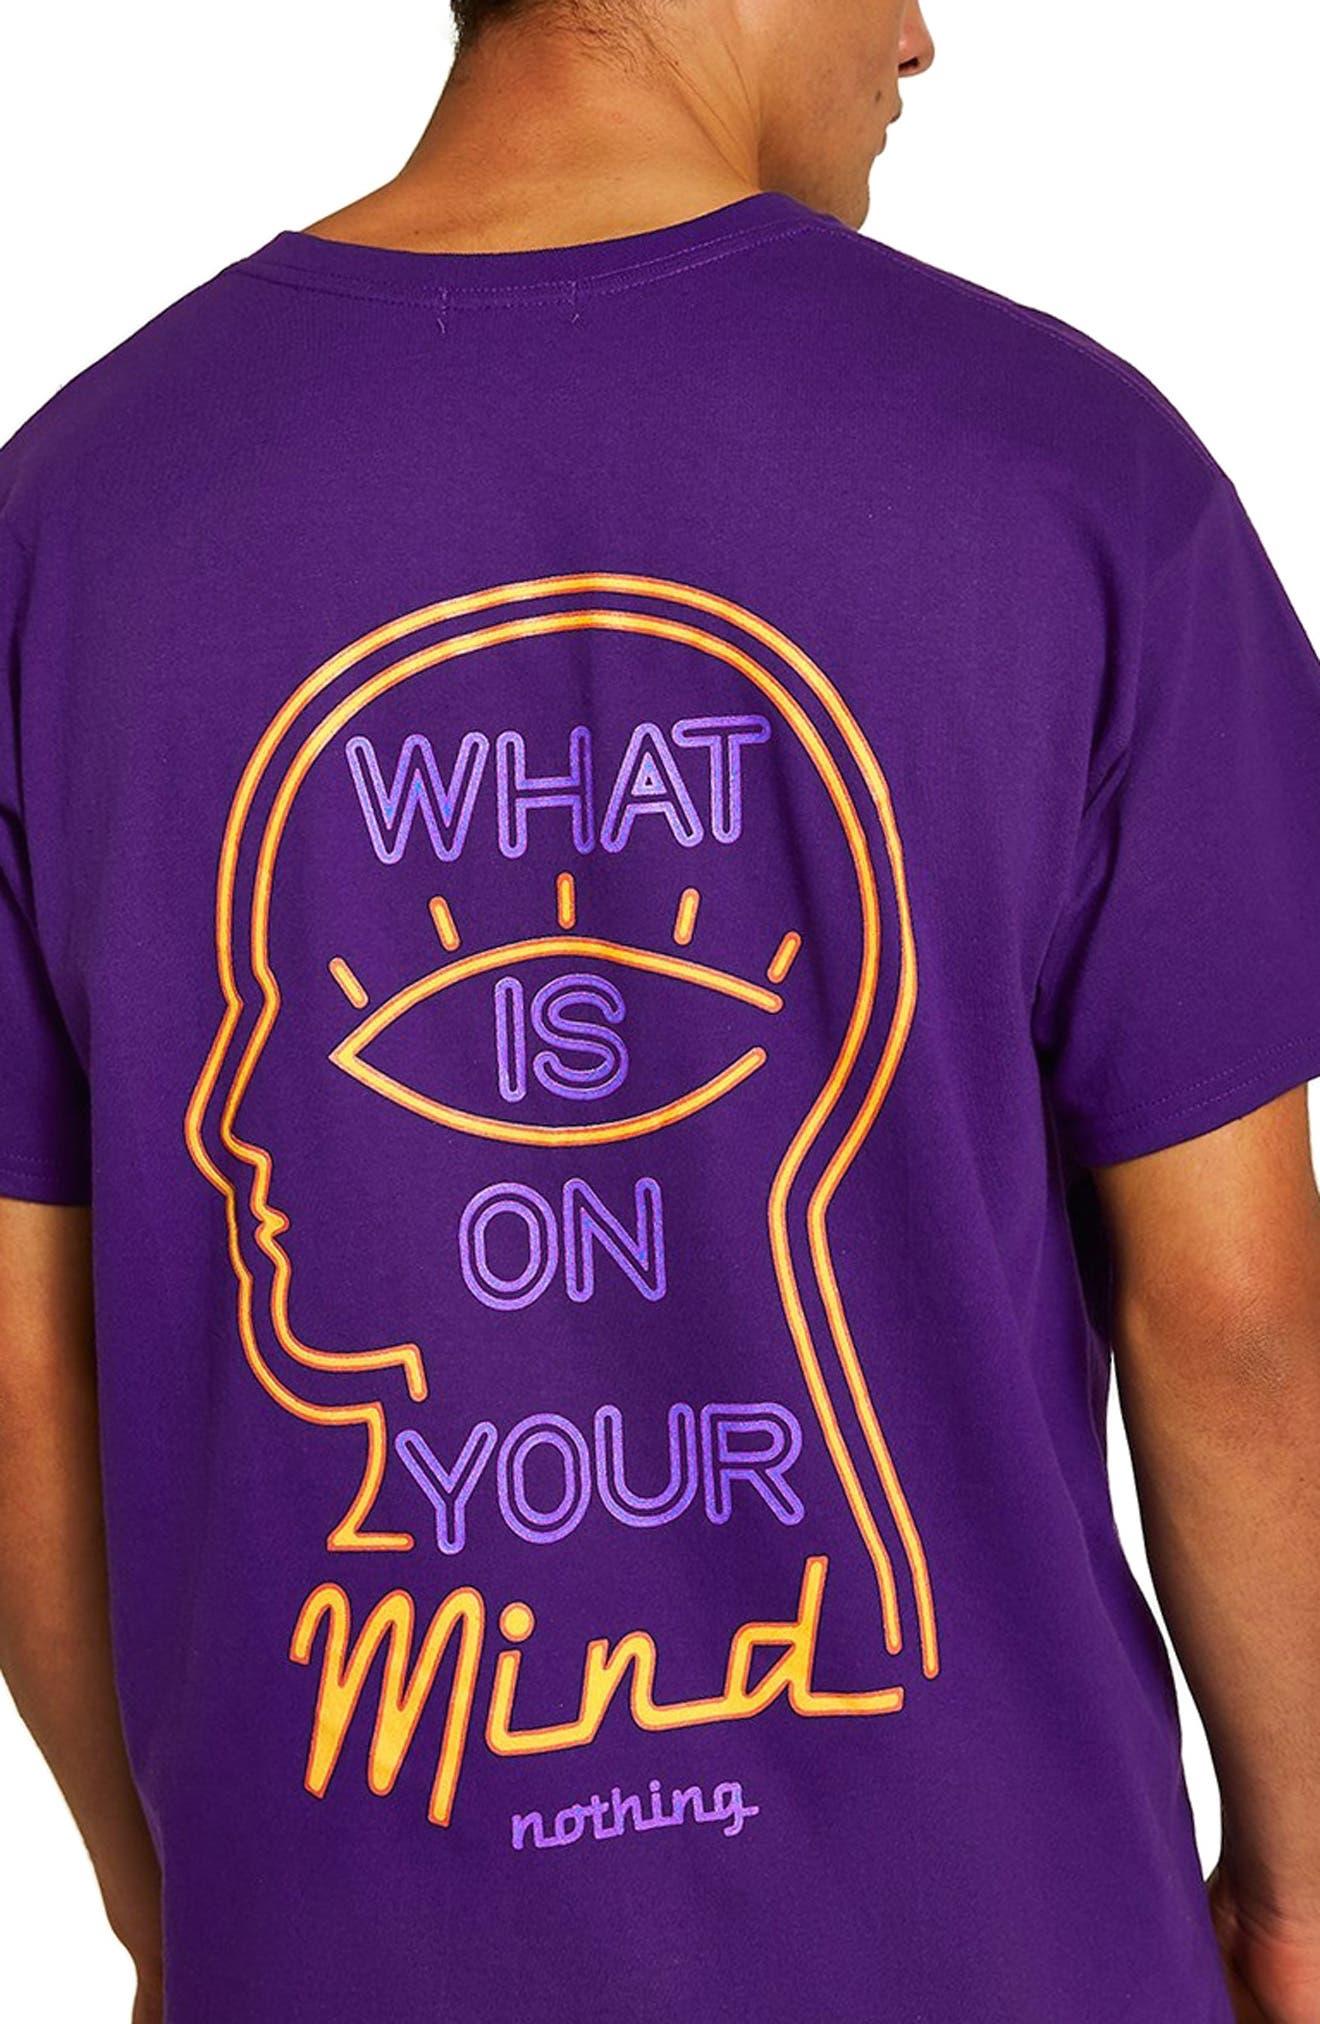 On Your Mind Graphic T-Shirt,                             Alternate thumbnail 3, color,                             PURPLE MULTI